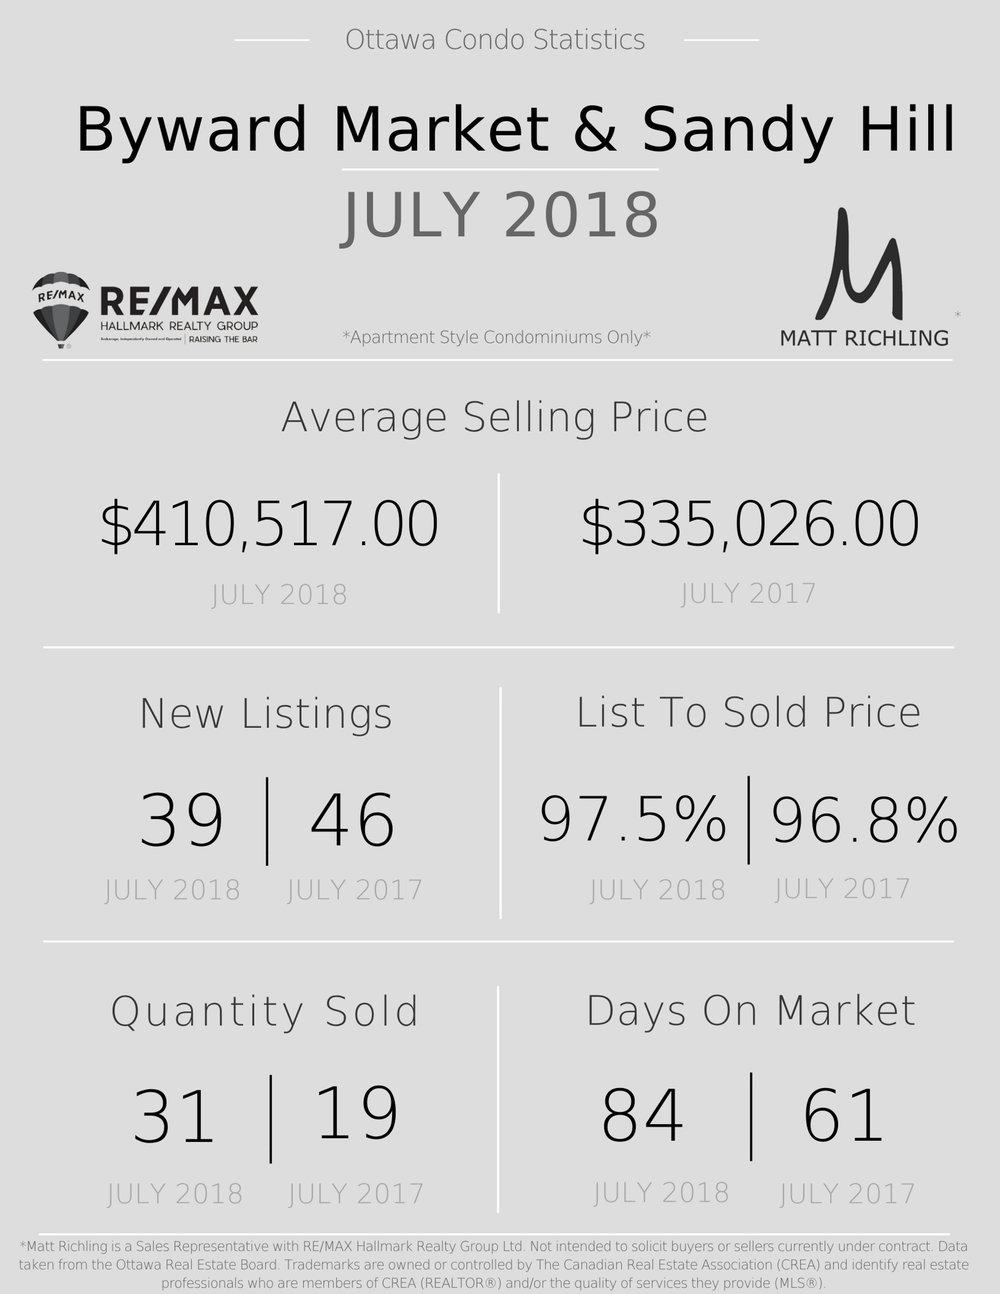 Condo Market Statistics Ottawa - Byward Market and Sandy Hill.jpg